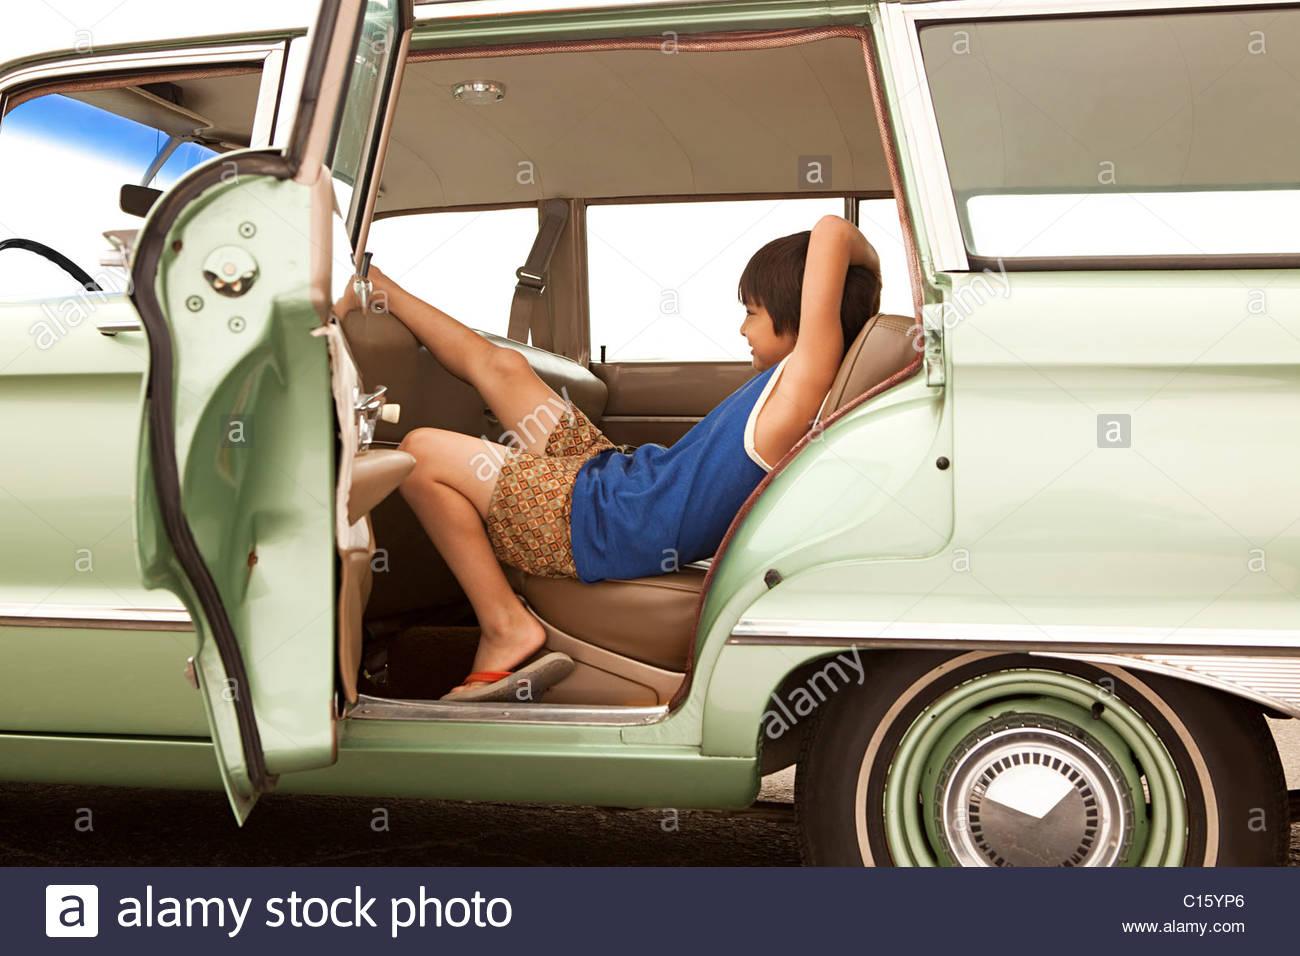 Sullen boy sitting in car - Stock Image